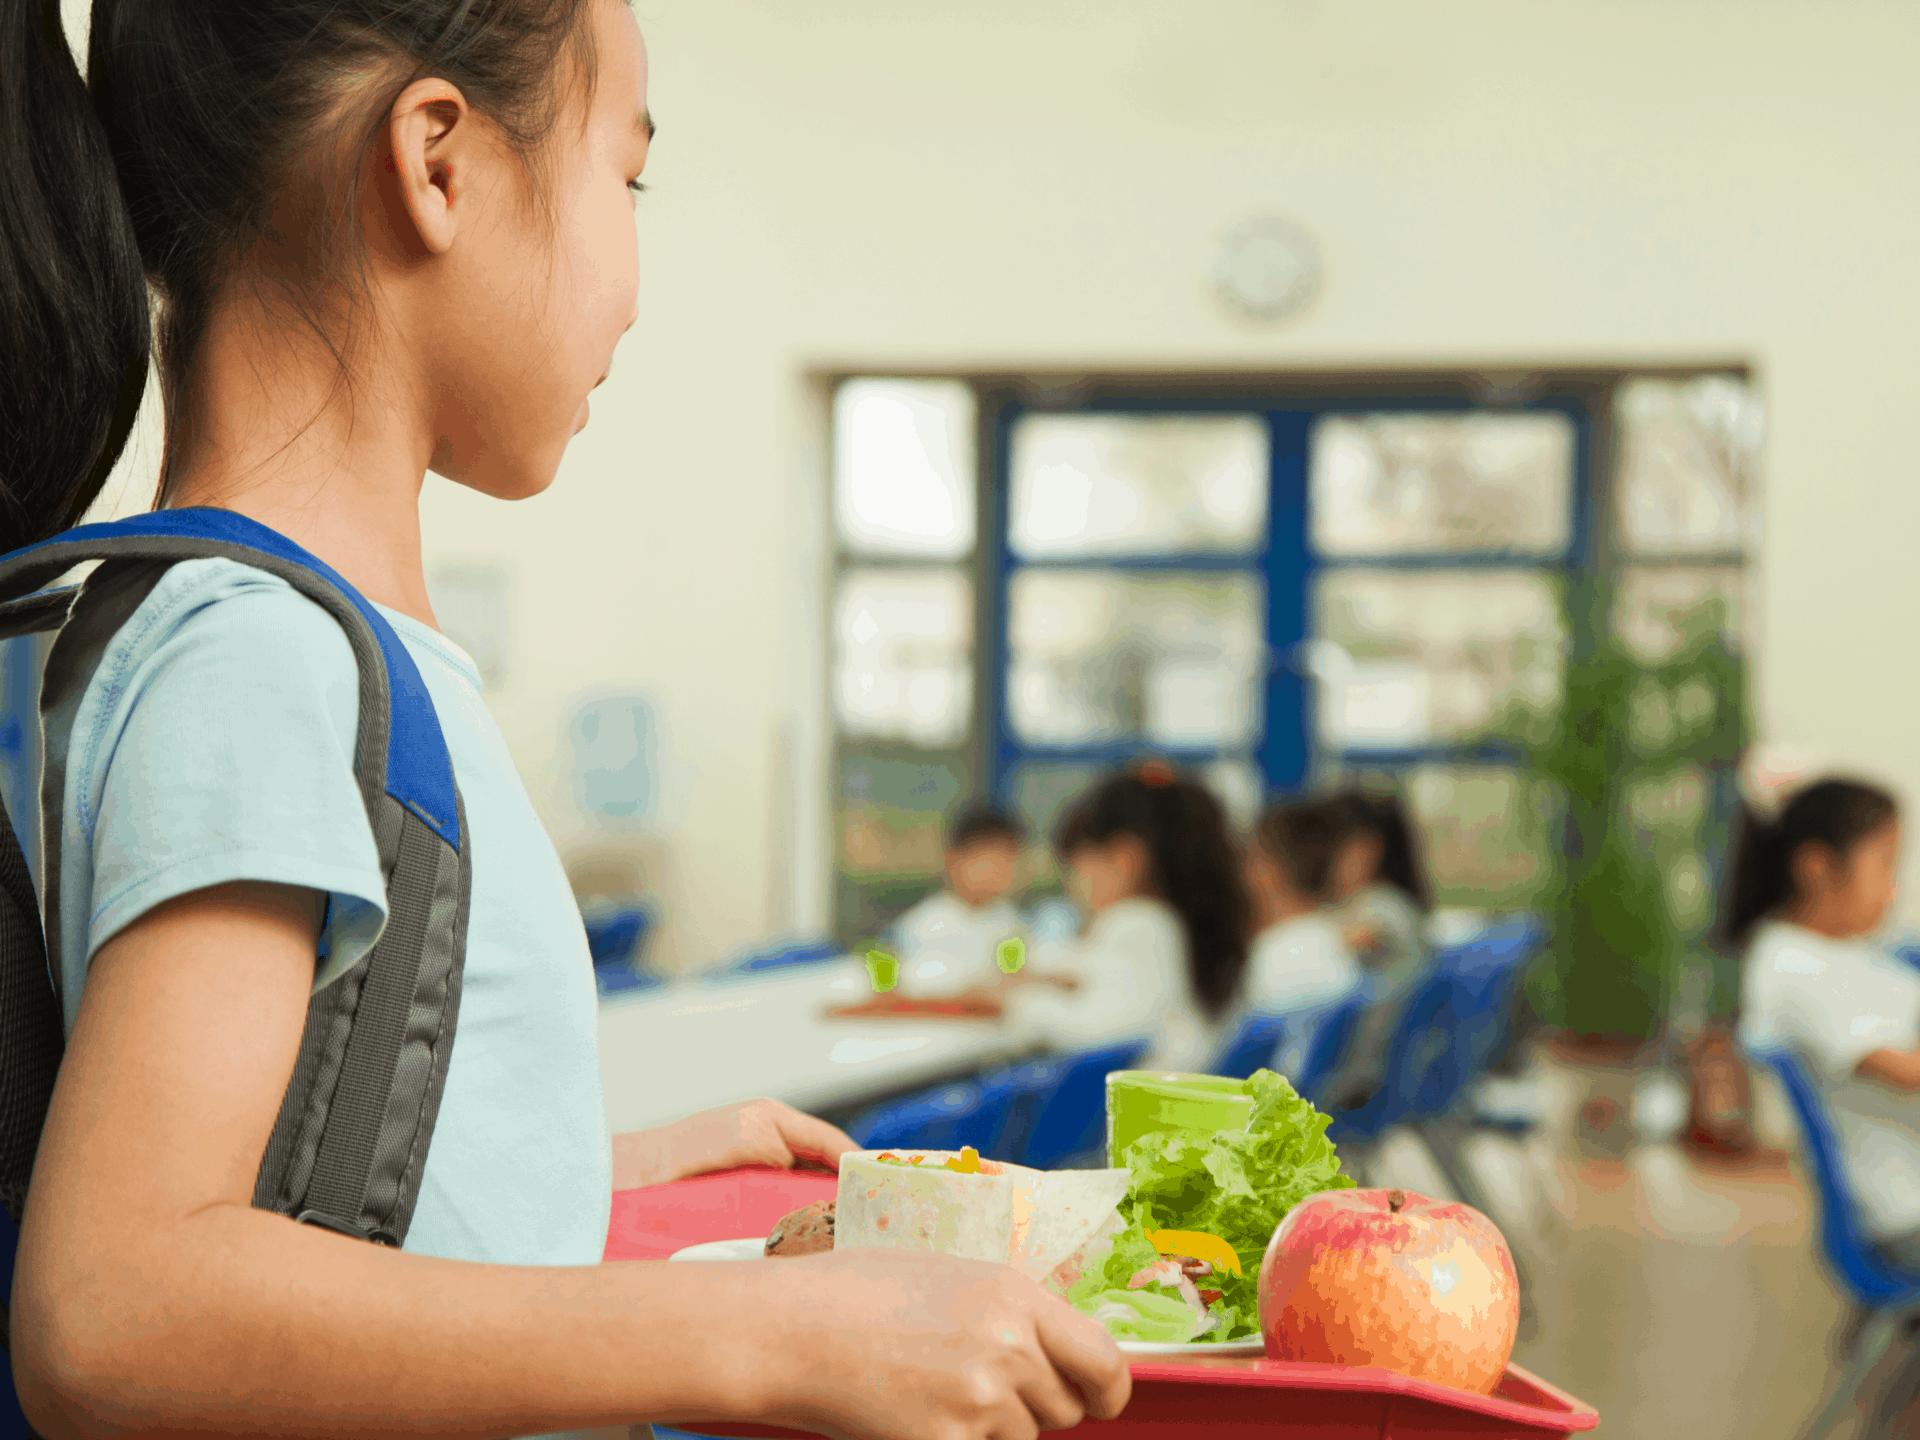 girl at school lunch